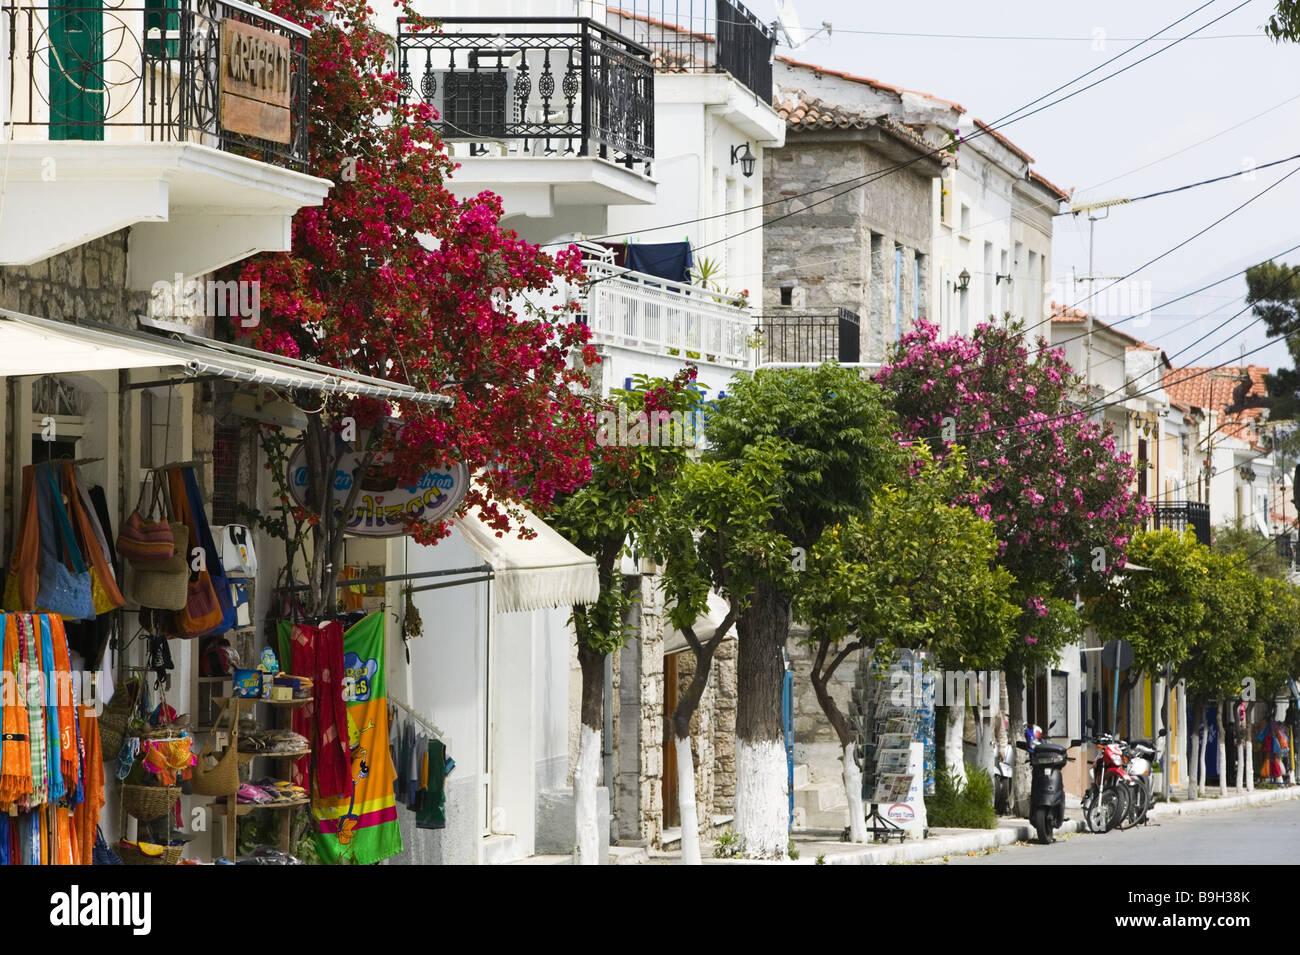 Greece island samos Pythagorion shopping streets Europe Mediterranean-island destination city streets buildings Stock Photo